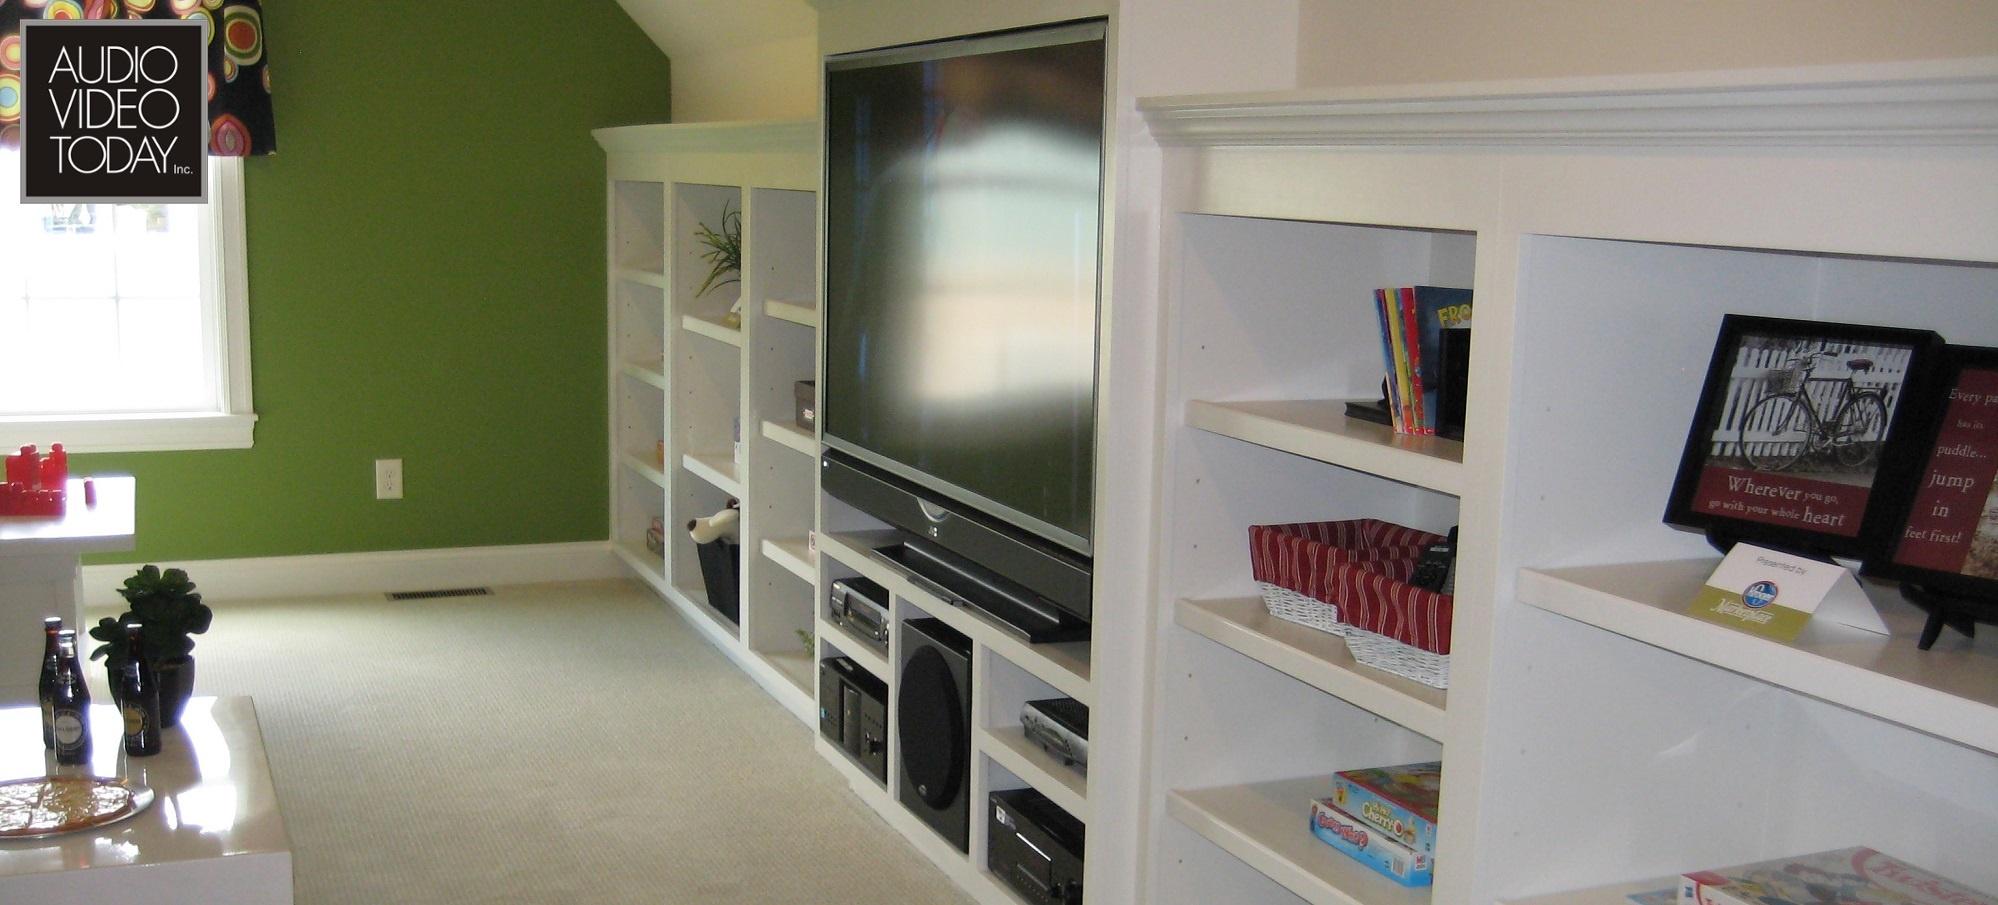 Home-theater-7c.jpg